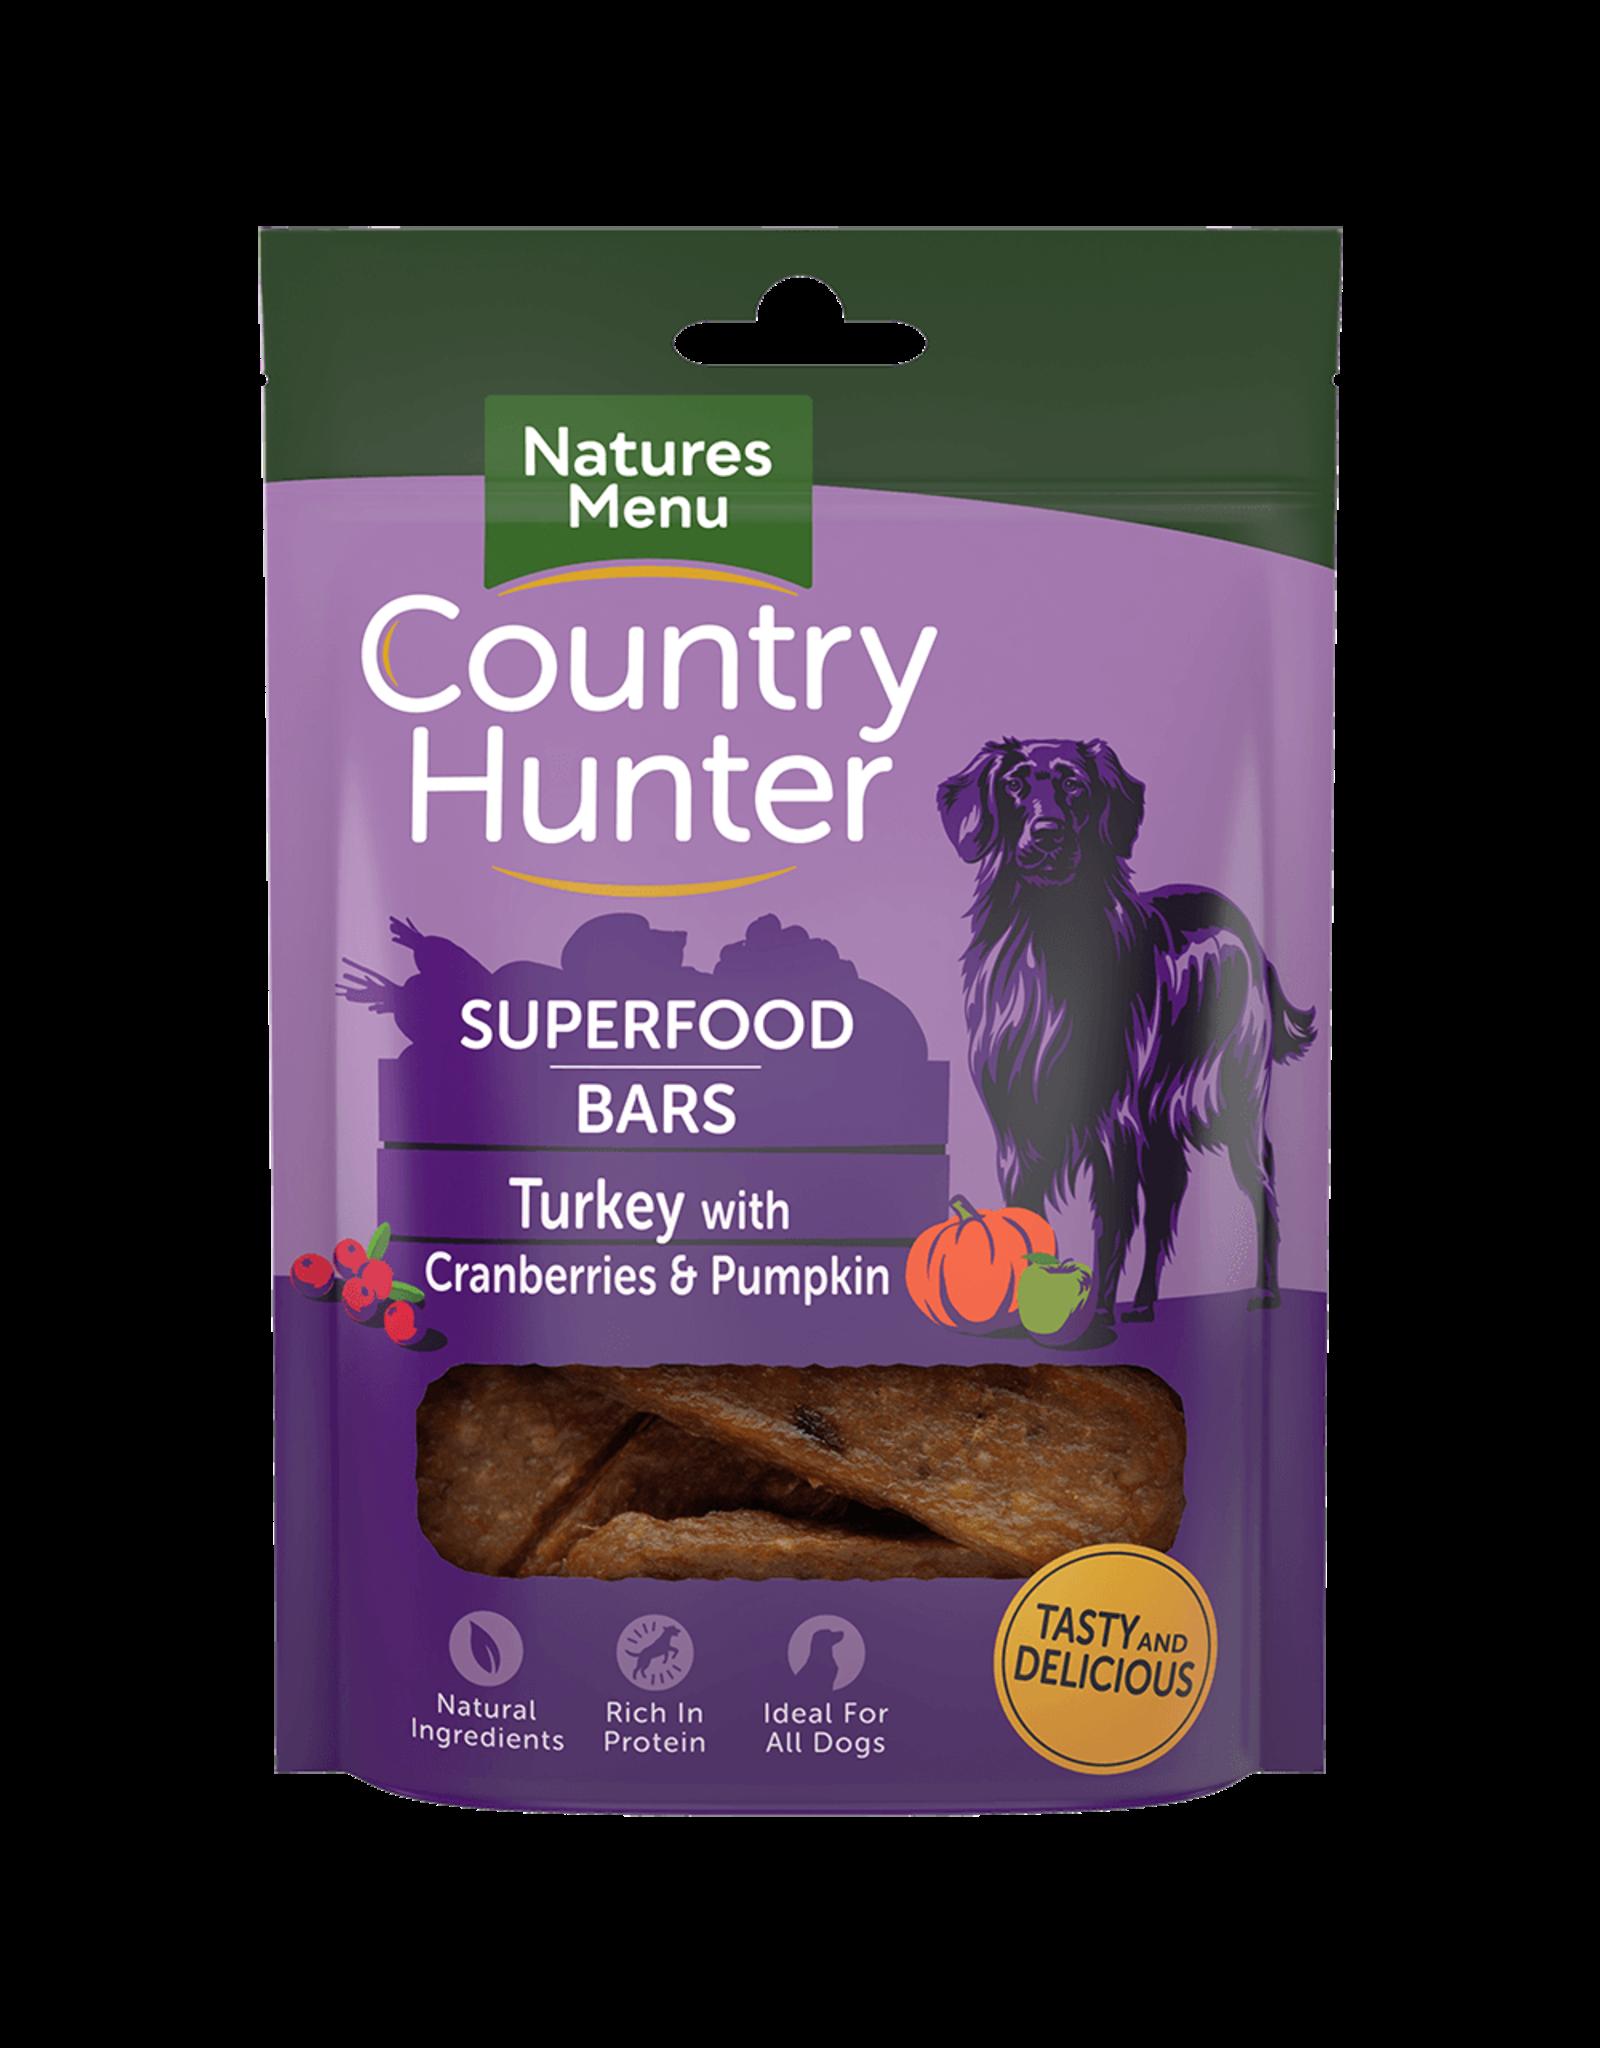 natures menu Country Hunter Superfood Bar Turkey with Cranberries & Pumpkin Dog Treat, 100g